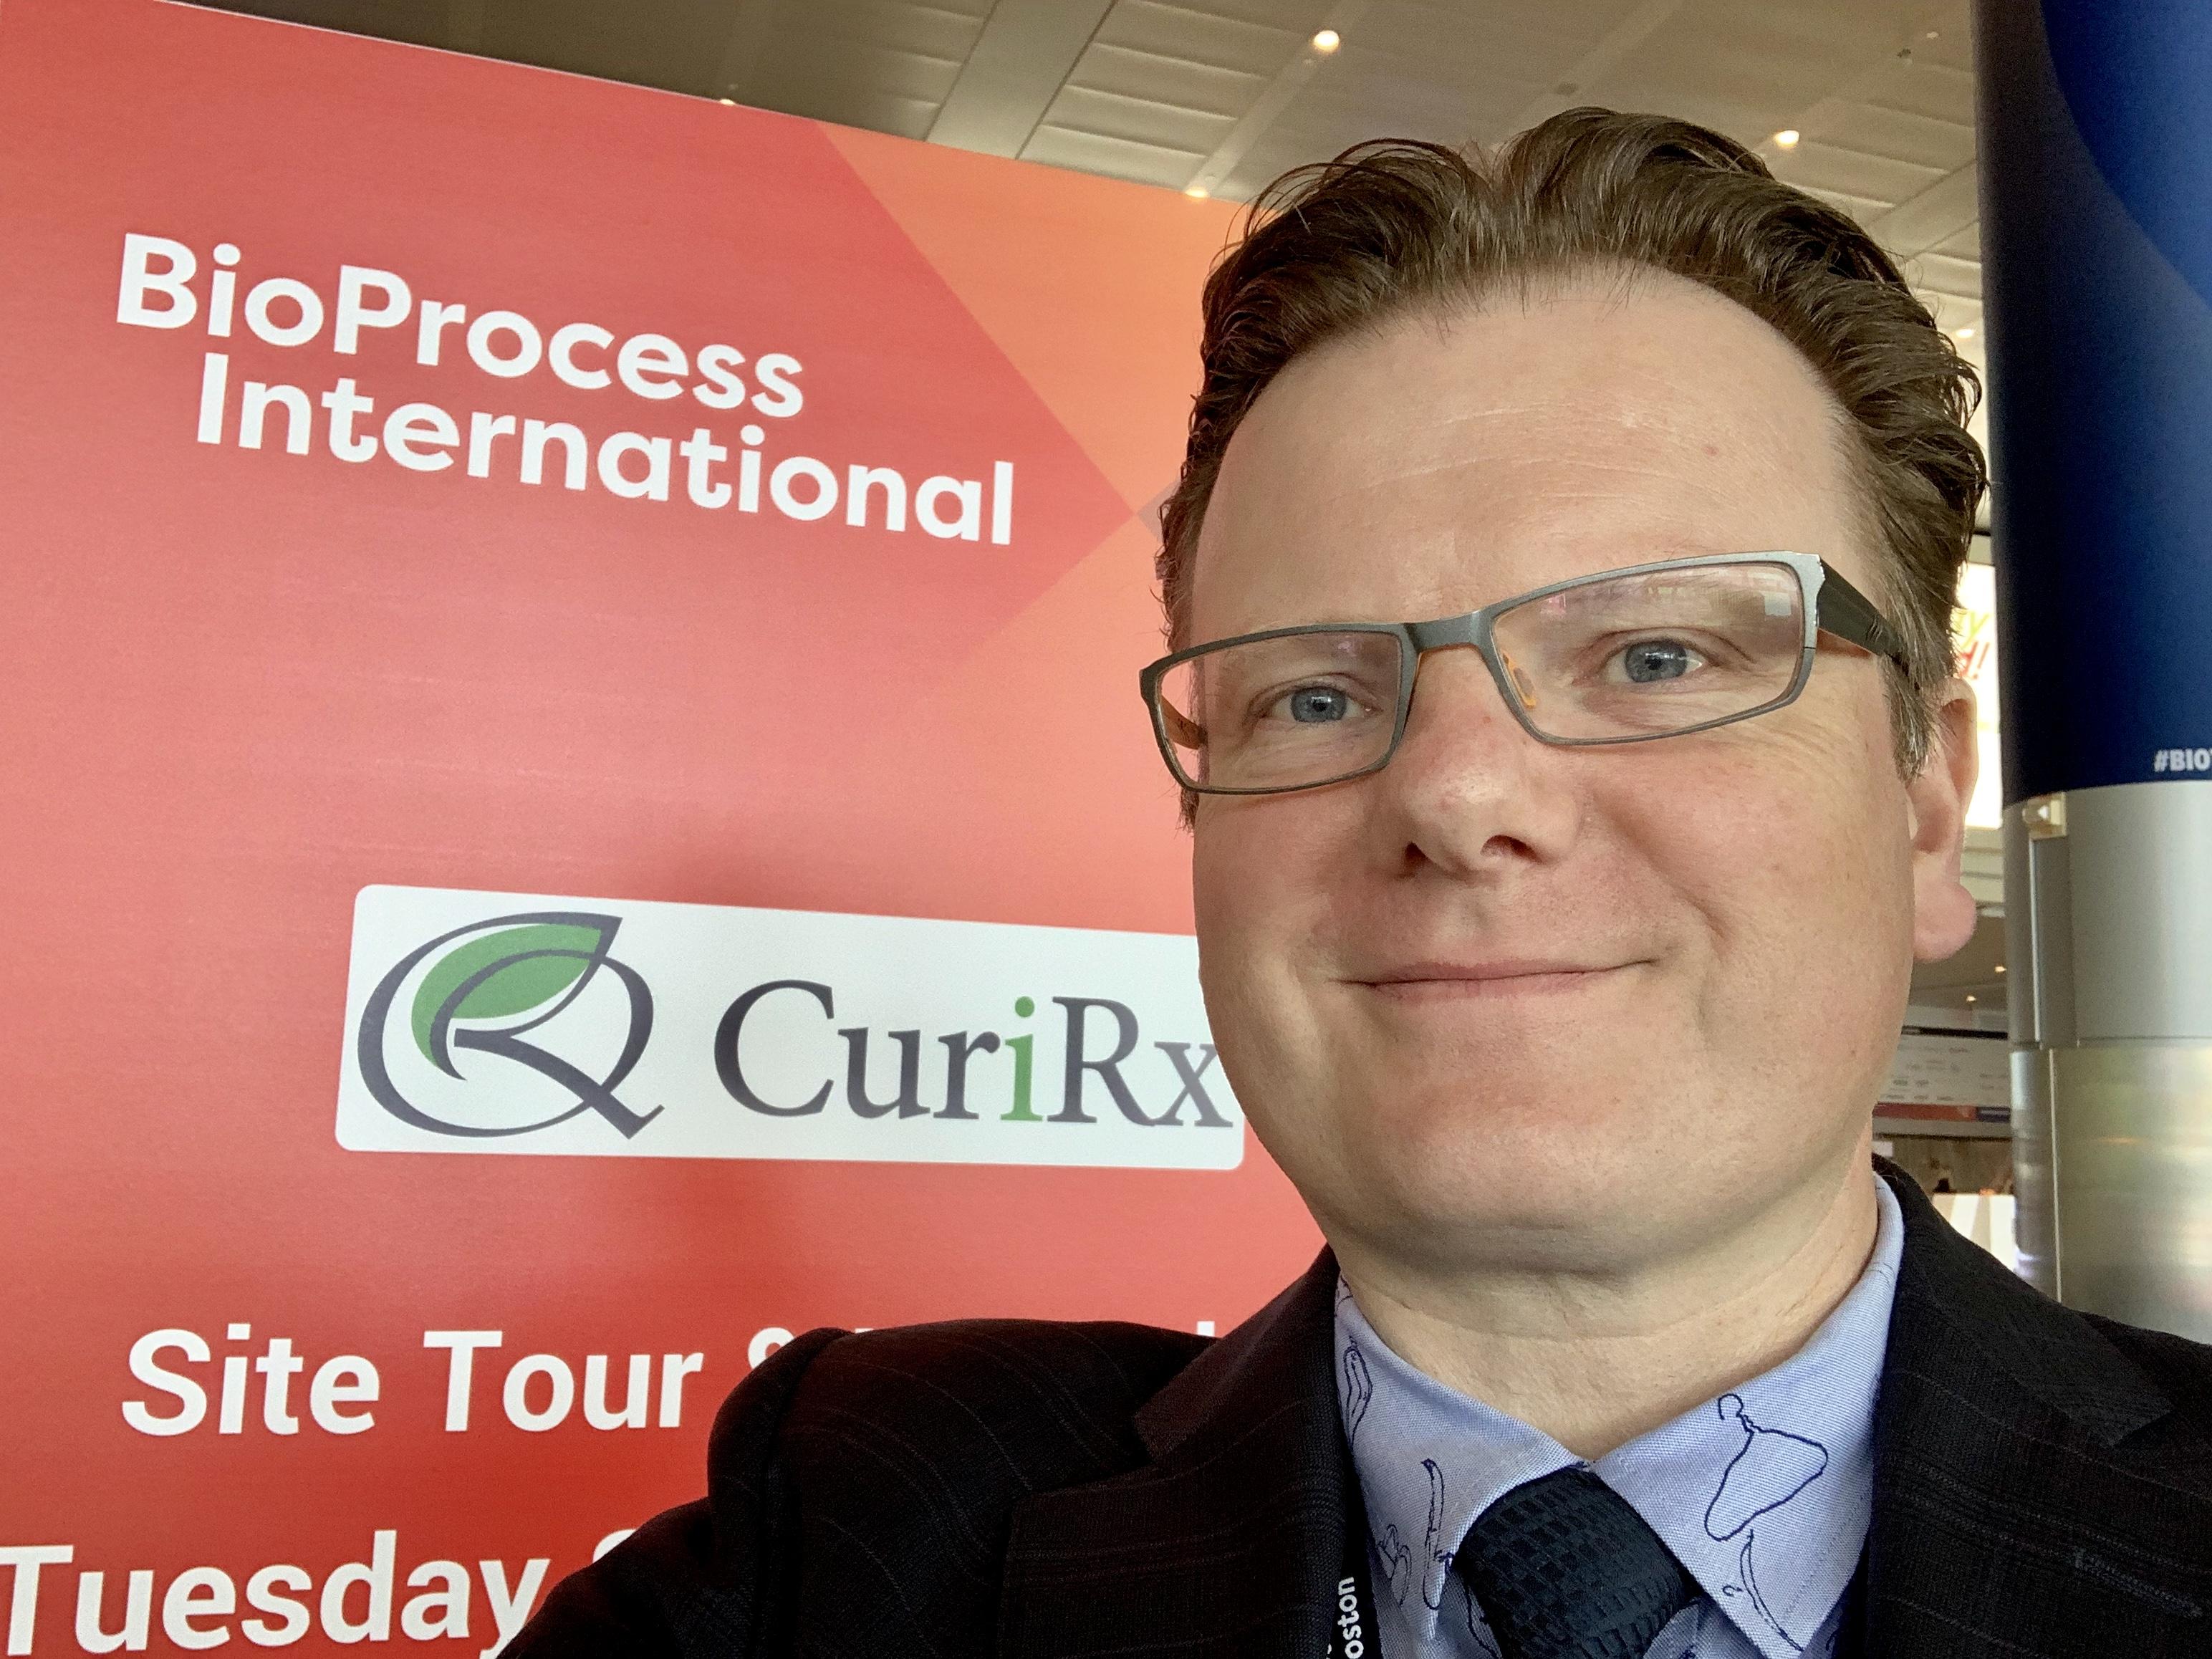 BioProcess International Week